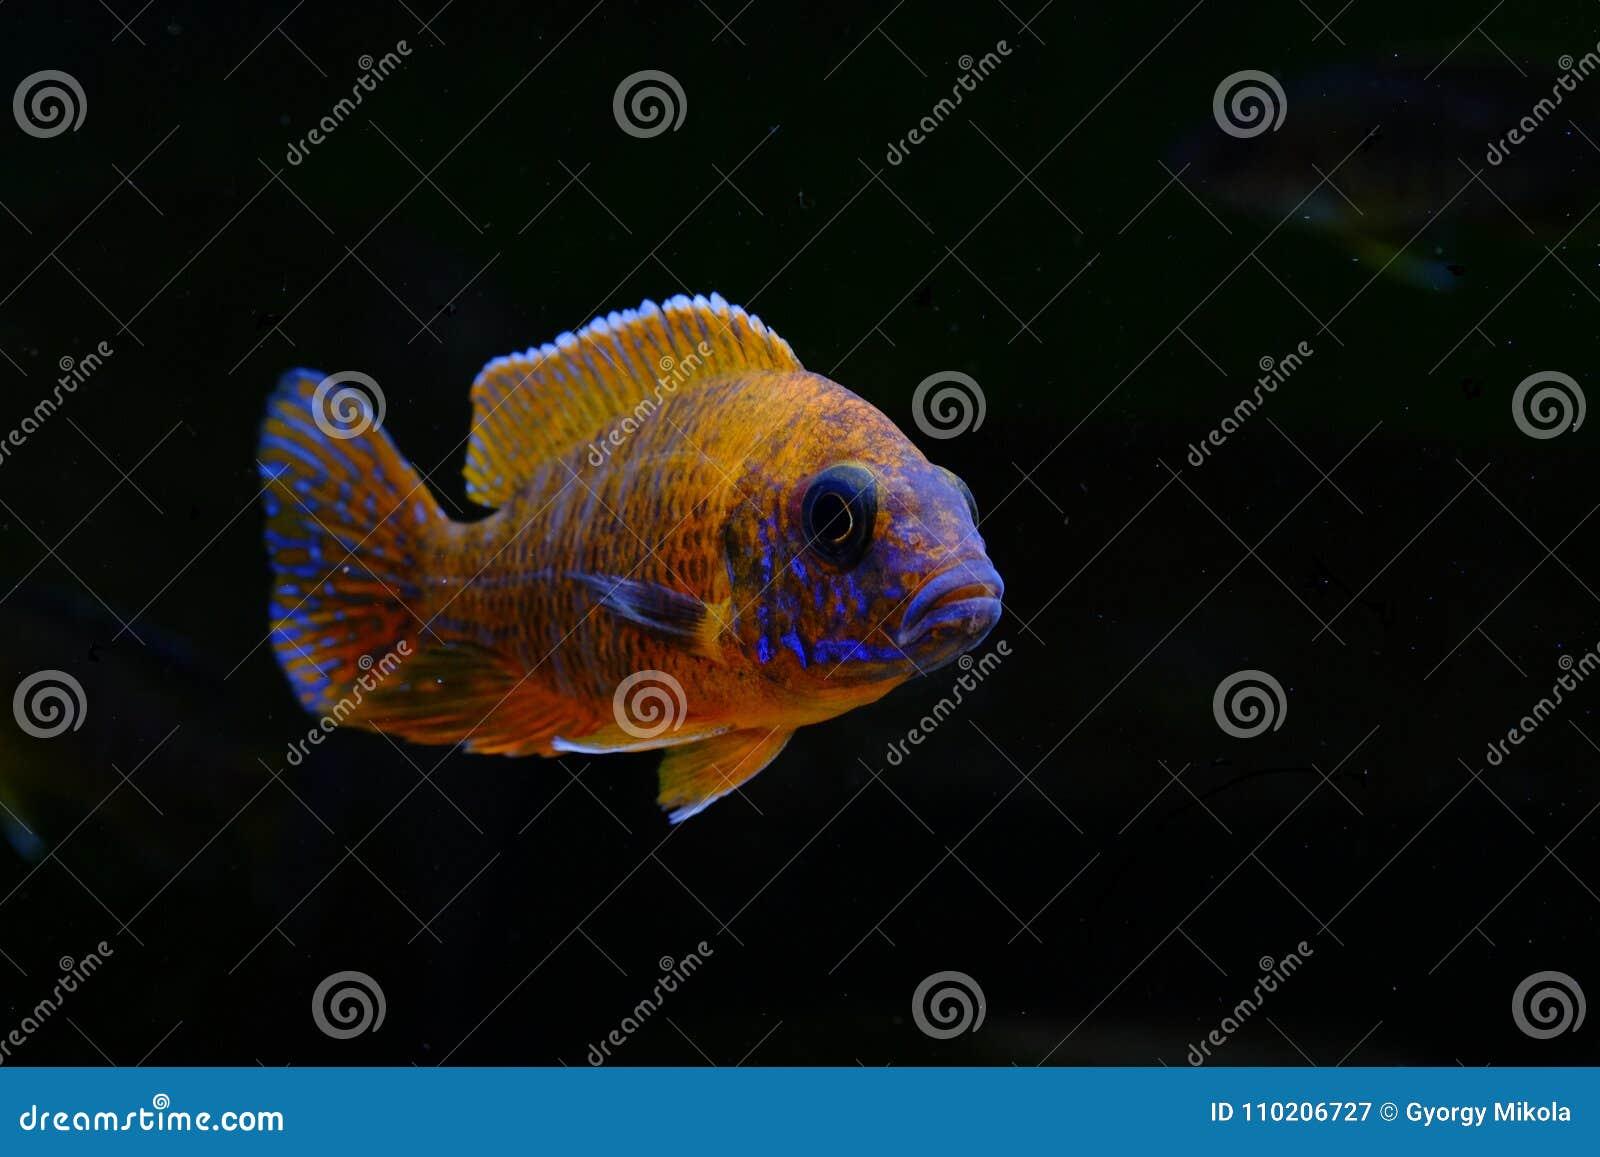 Afrikaanse het aquariumvissen van Malawi cichlid zoetwater